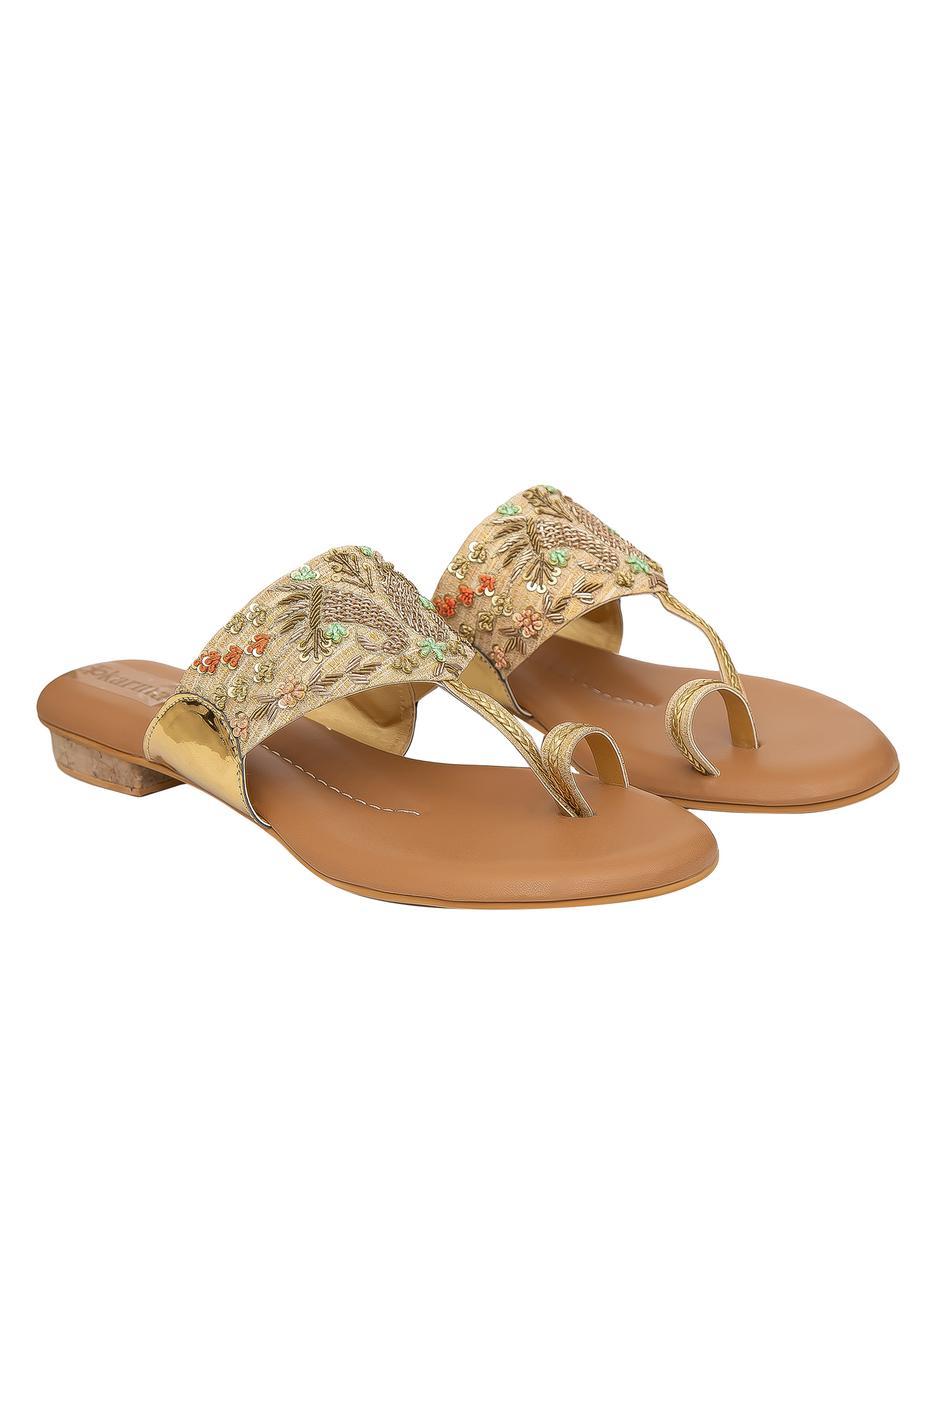 Mor Kolhapuri Sandals